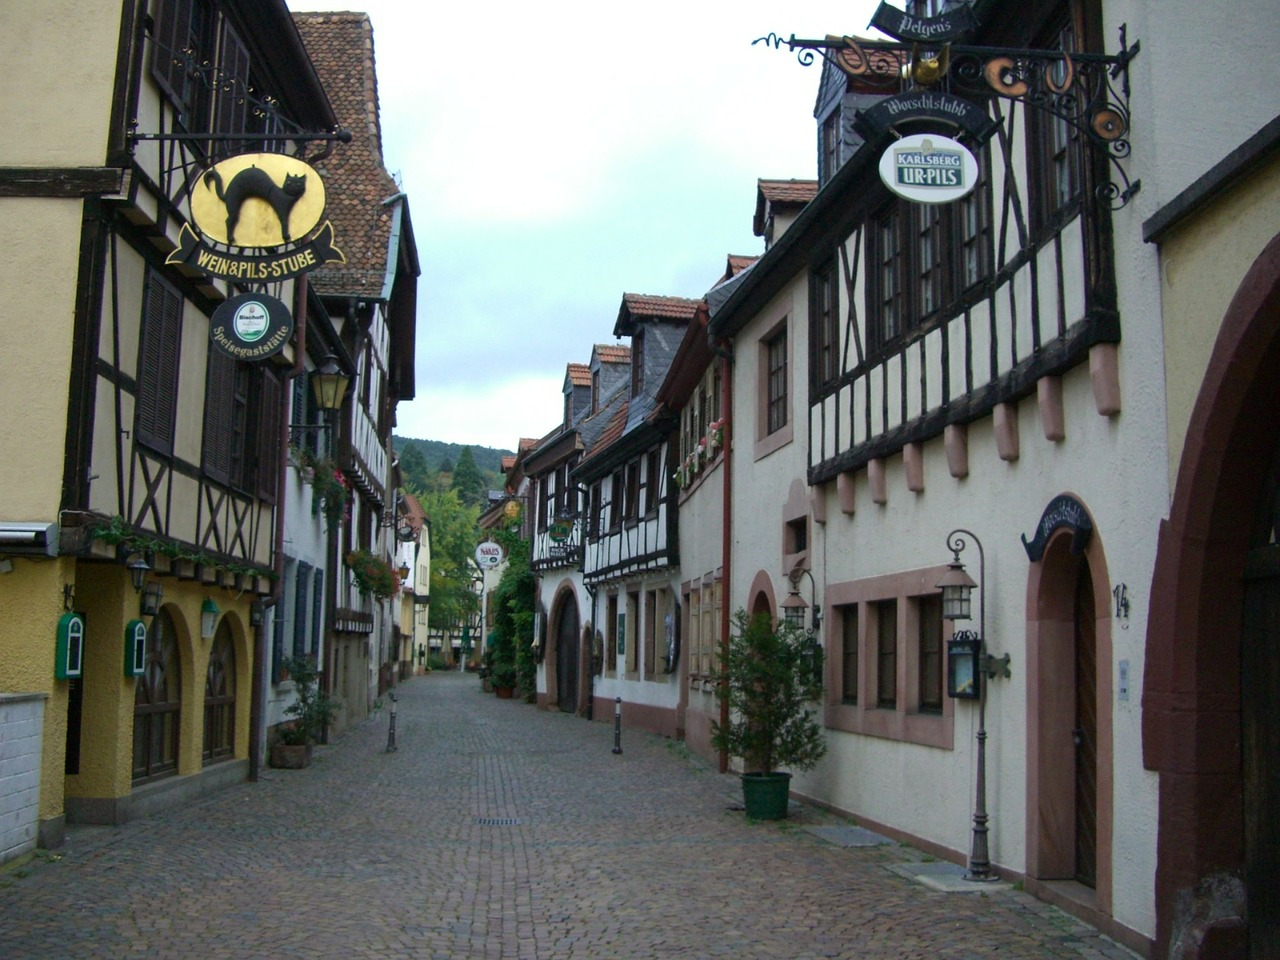 Gasse in Neustadt